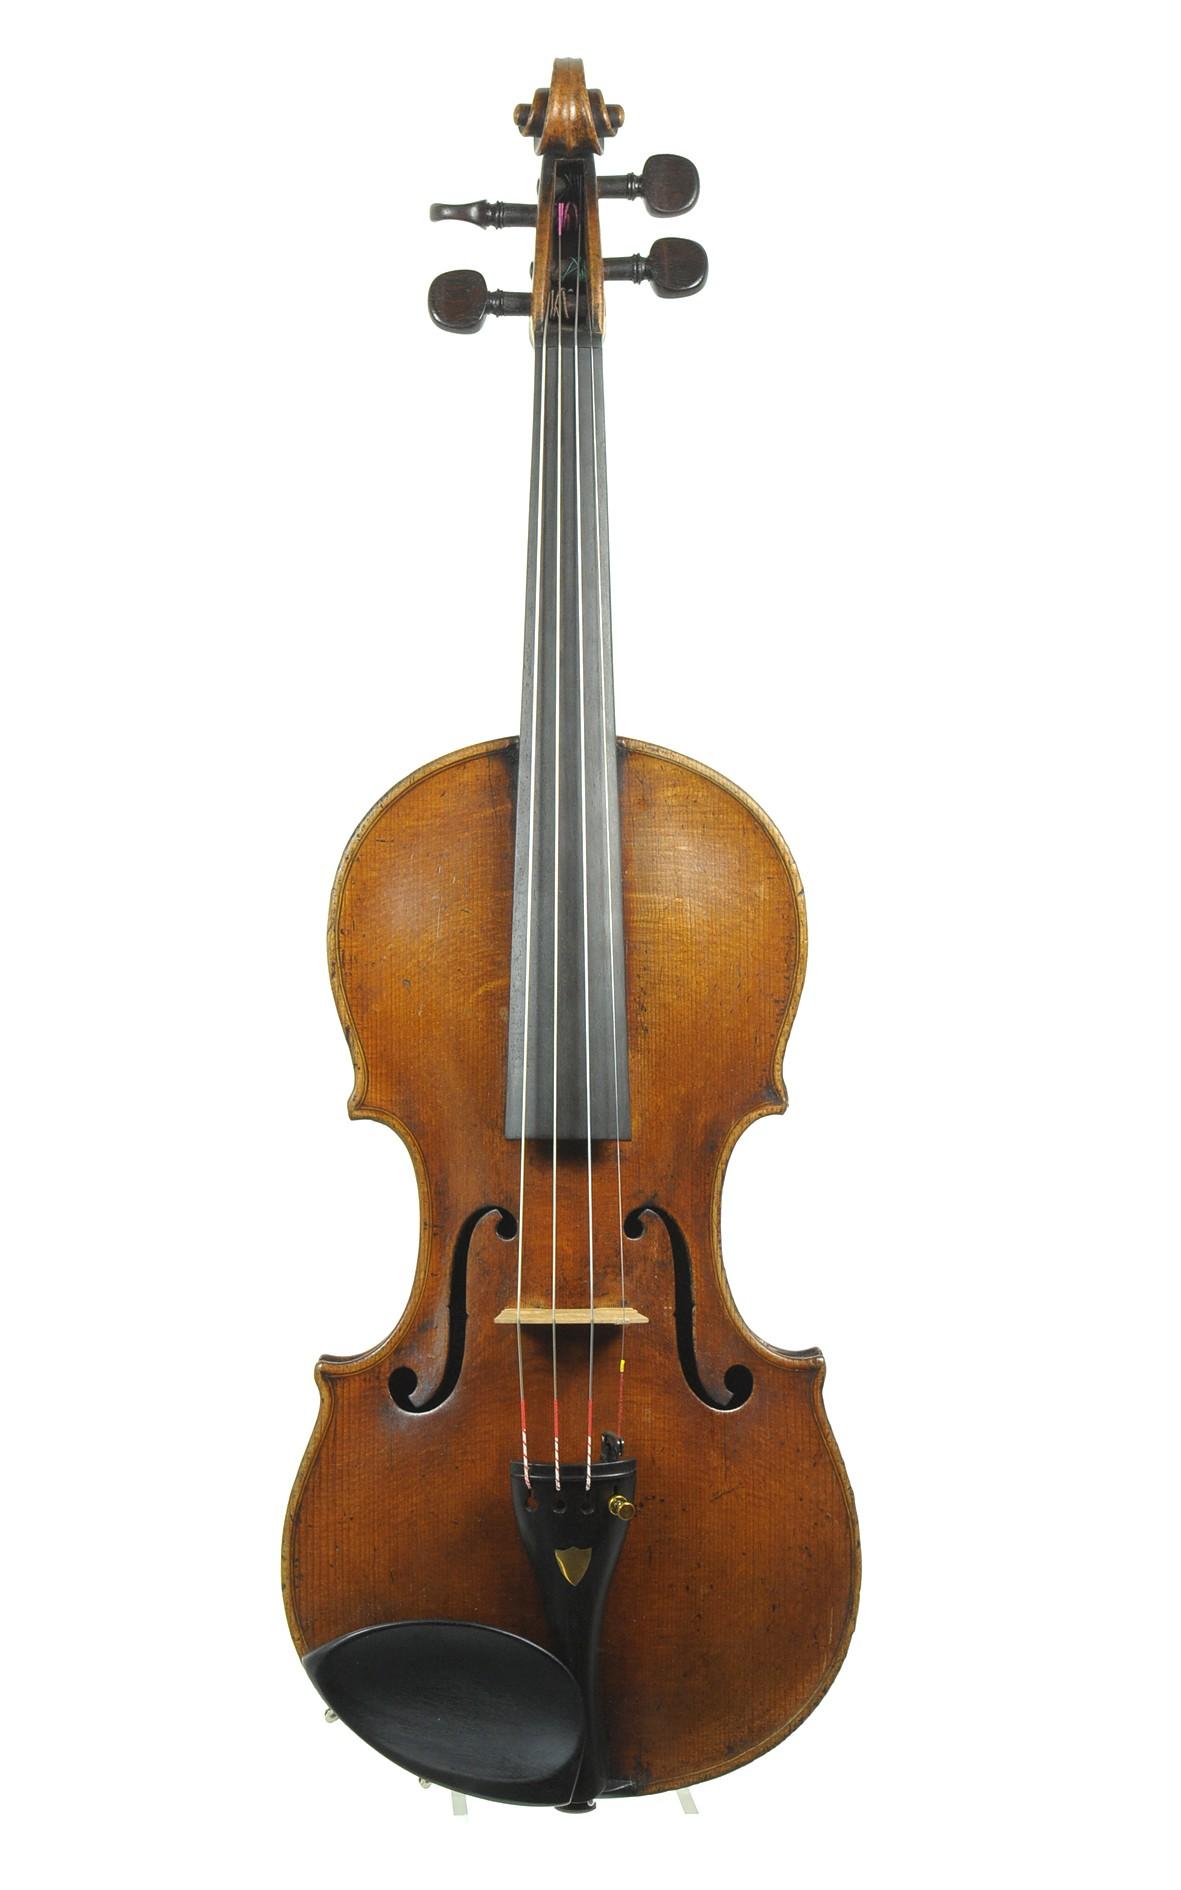 Violin, copy of Santo Serafino / Sanctus Seraphin - top